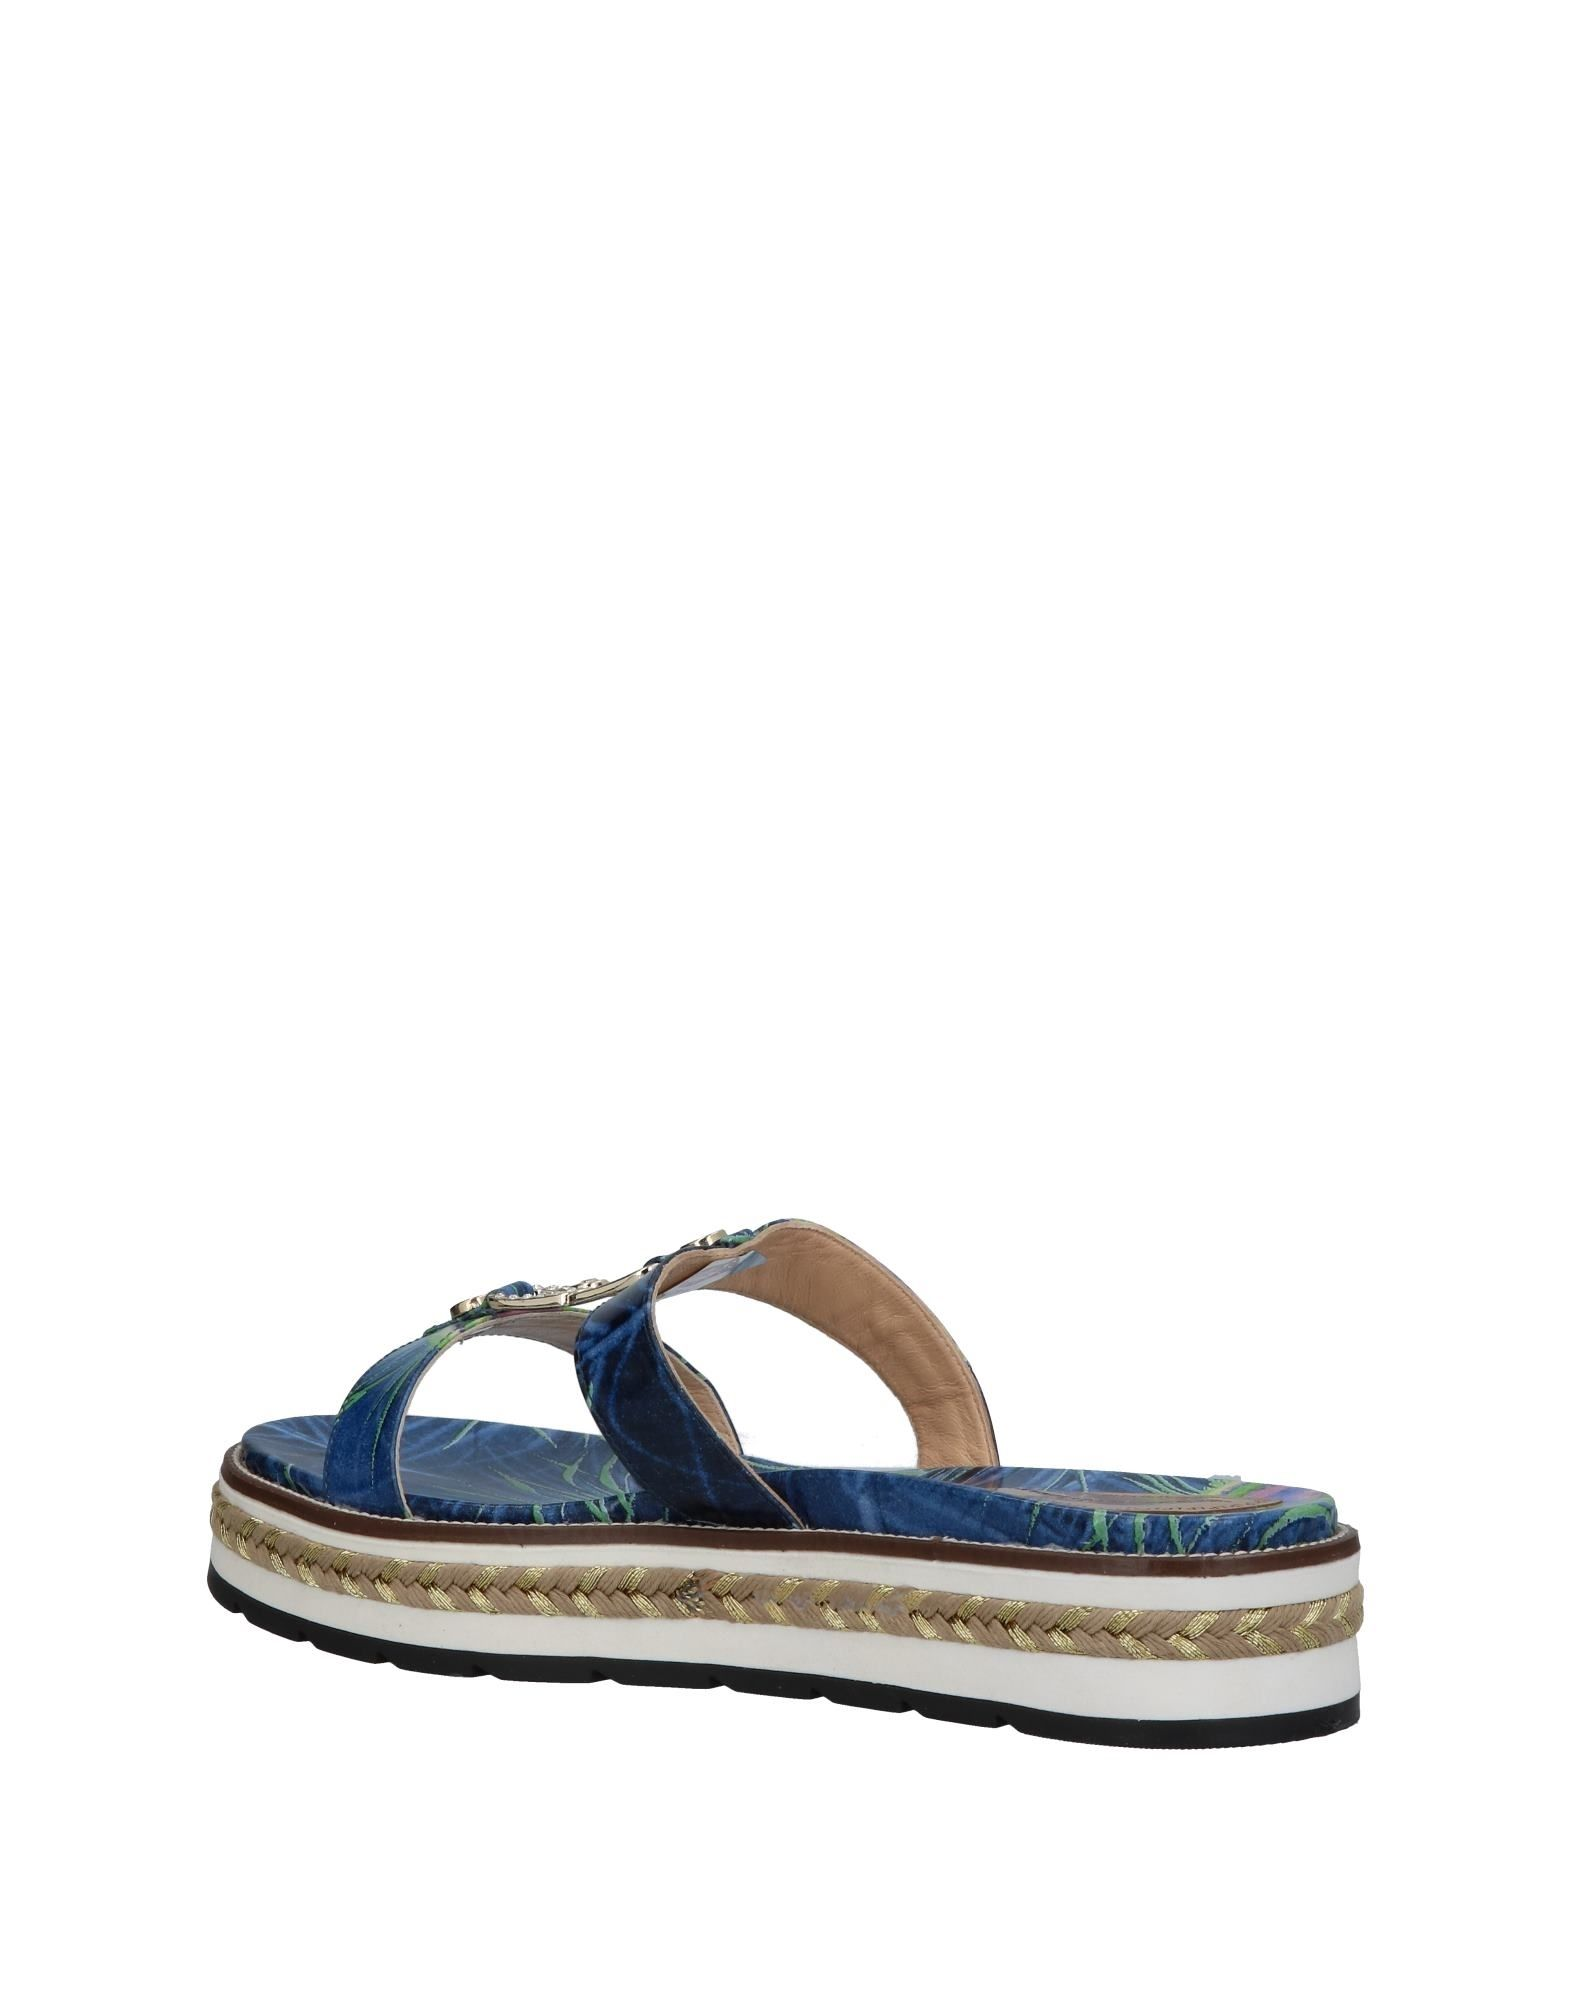 Loretta Pettinari Sandalen Qualität Damen  11385859IR Gute Qualität Sandalen beliebte Schuhe 92655c